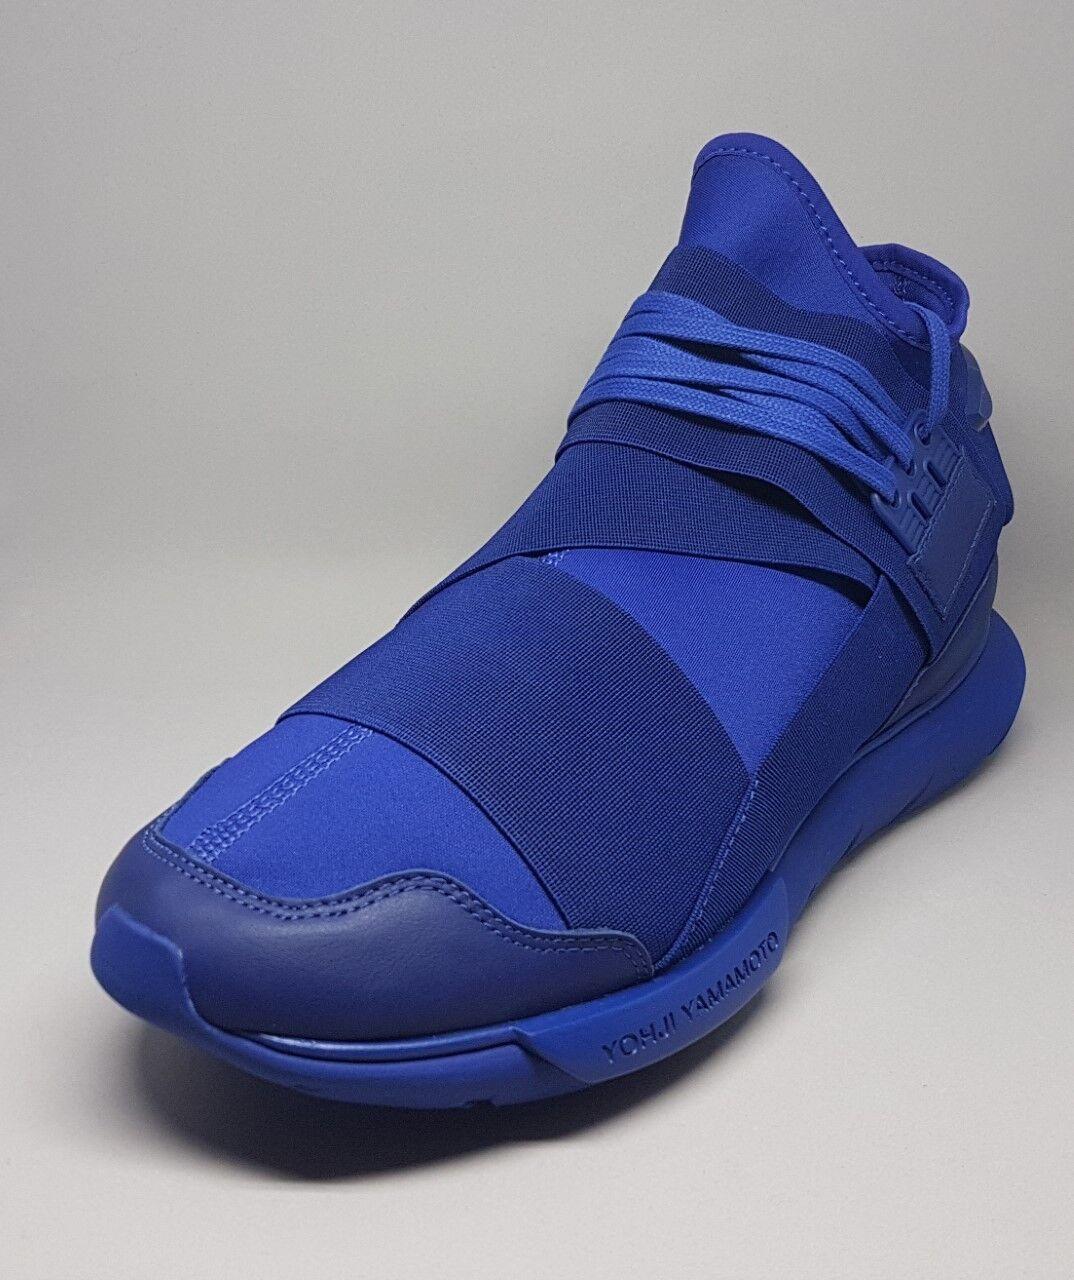 S82124 Adidas Y-3 Qasa High Turnschuhe Blau Größe 10.5US  Men Turnschuhe schuhe